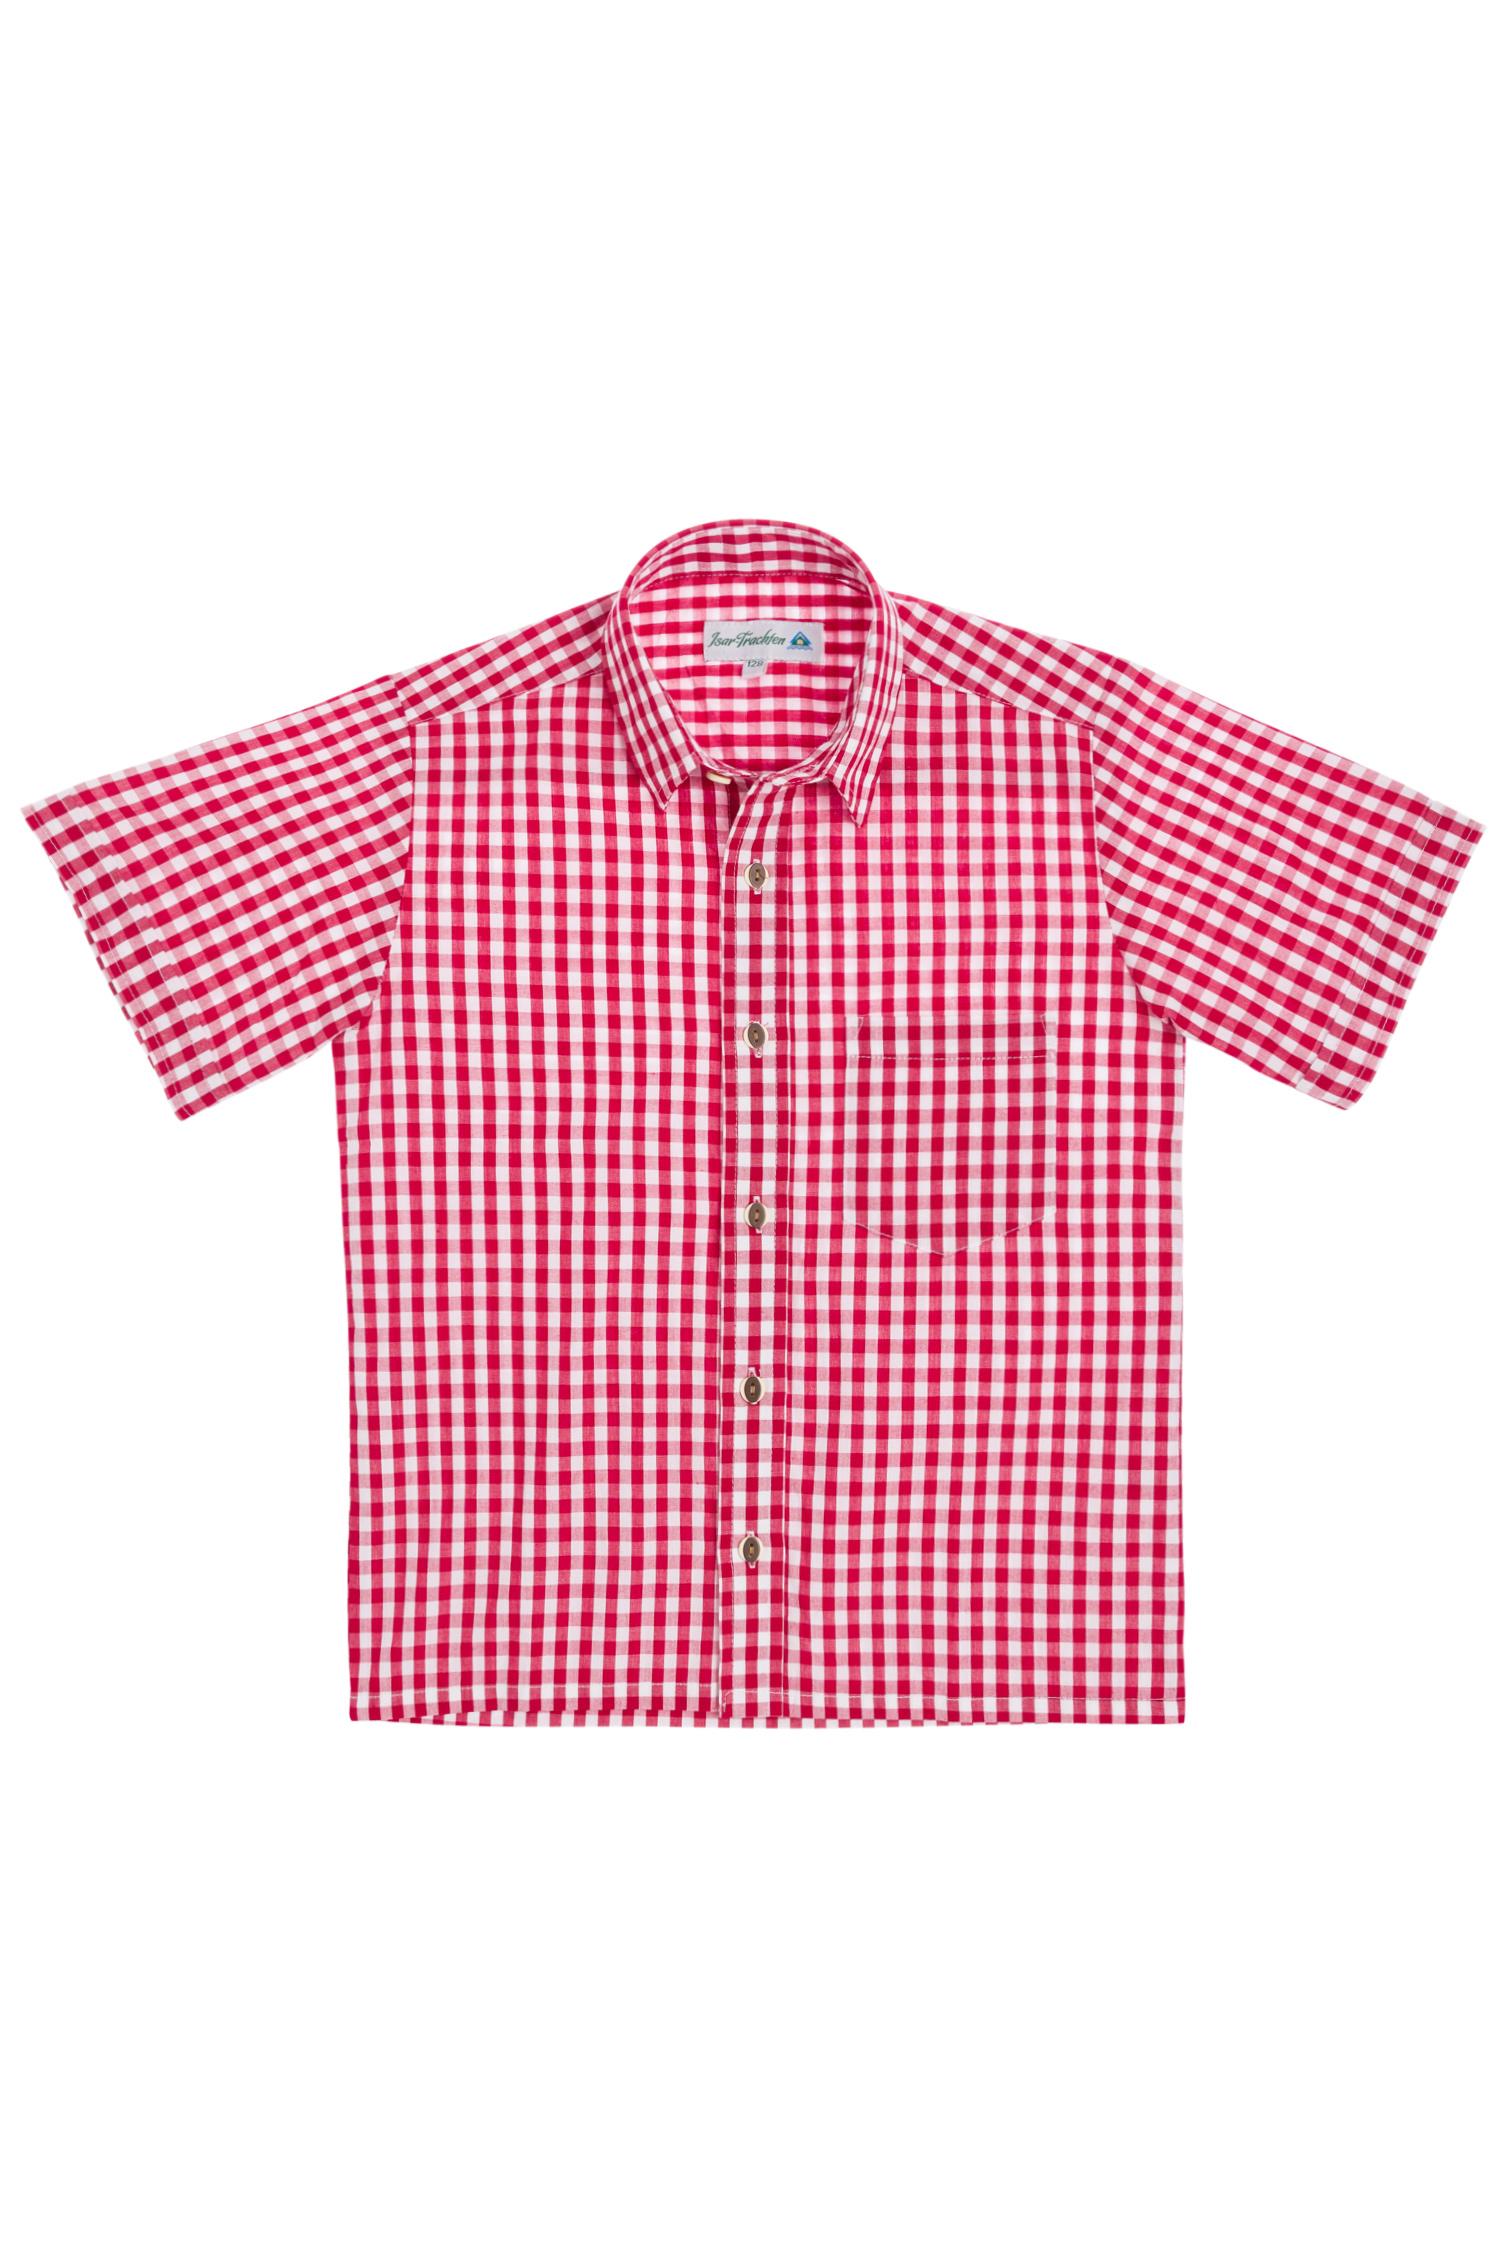 Kinderhemd kurzarm 68 | rot